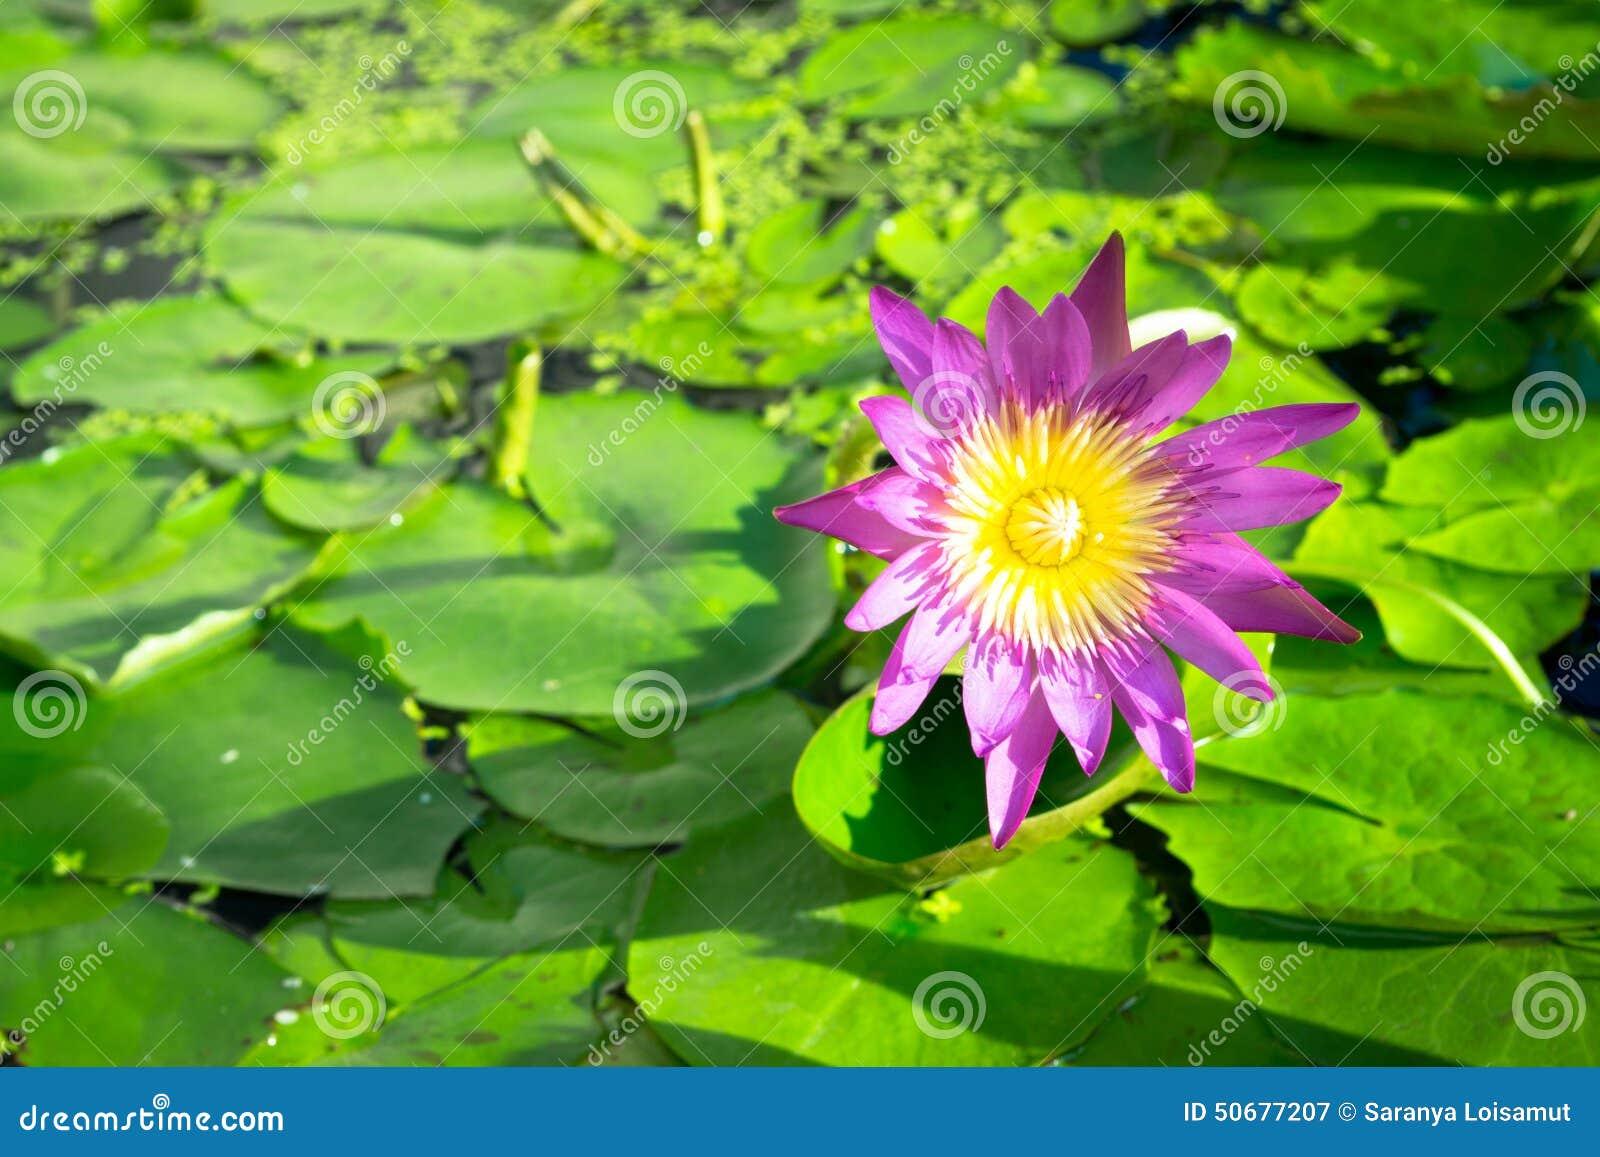 Lotus Flower Stock Image Image Of Flower Lungs Nurturing 50677207